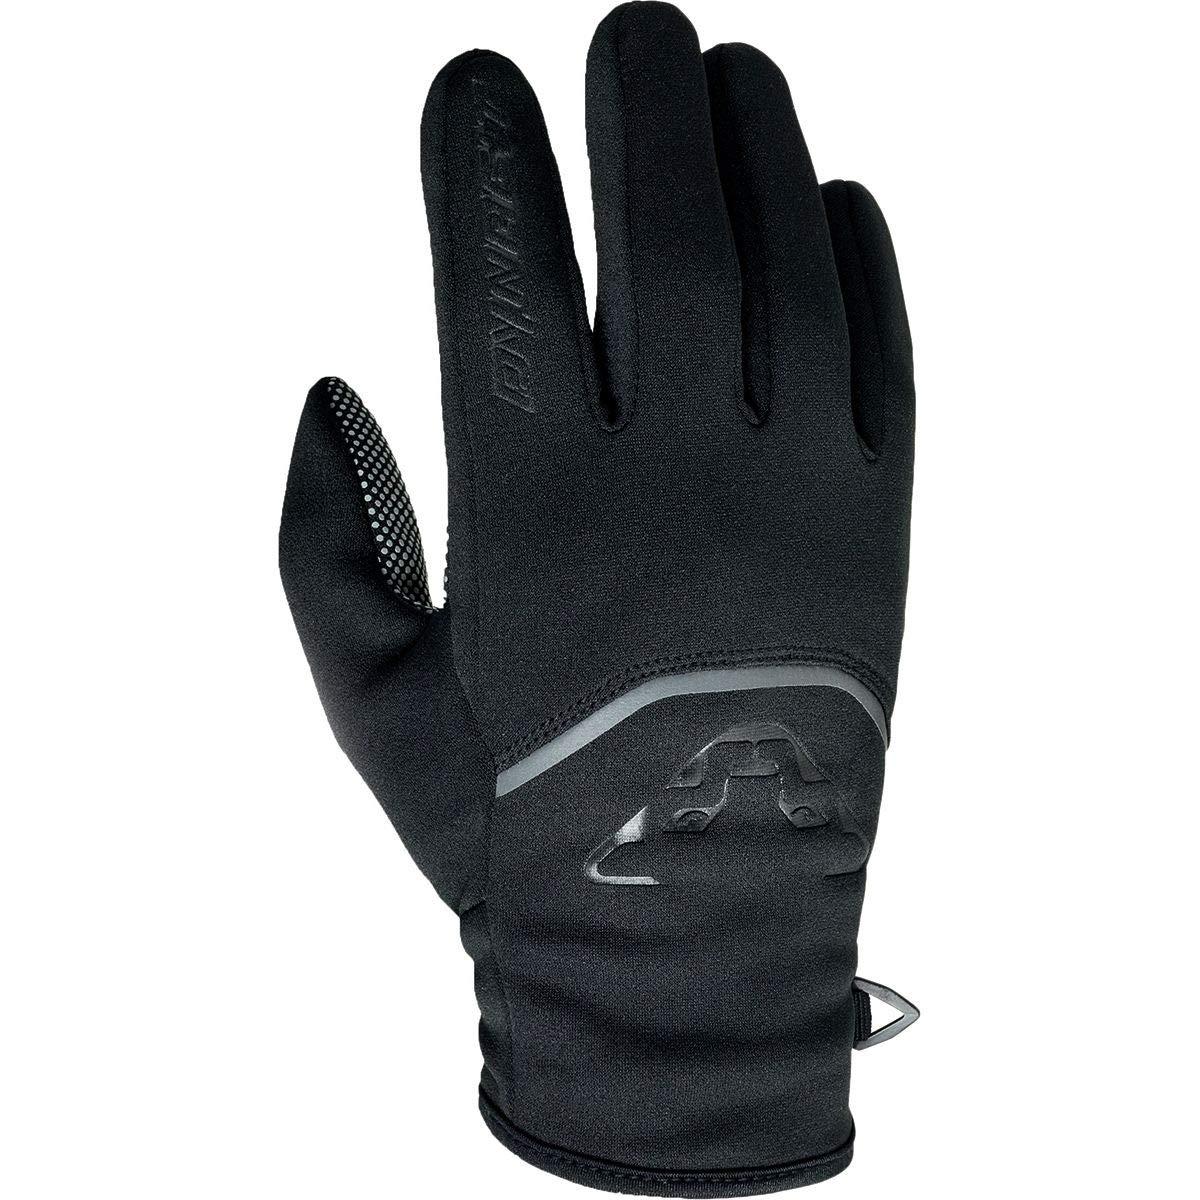 Dynafit Thermal Gloves Black M by Dynafit (Image #1)